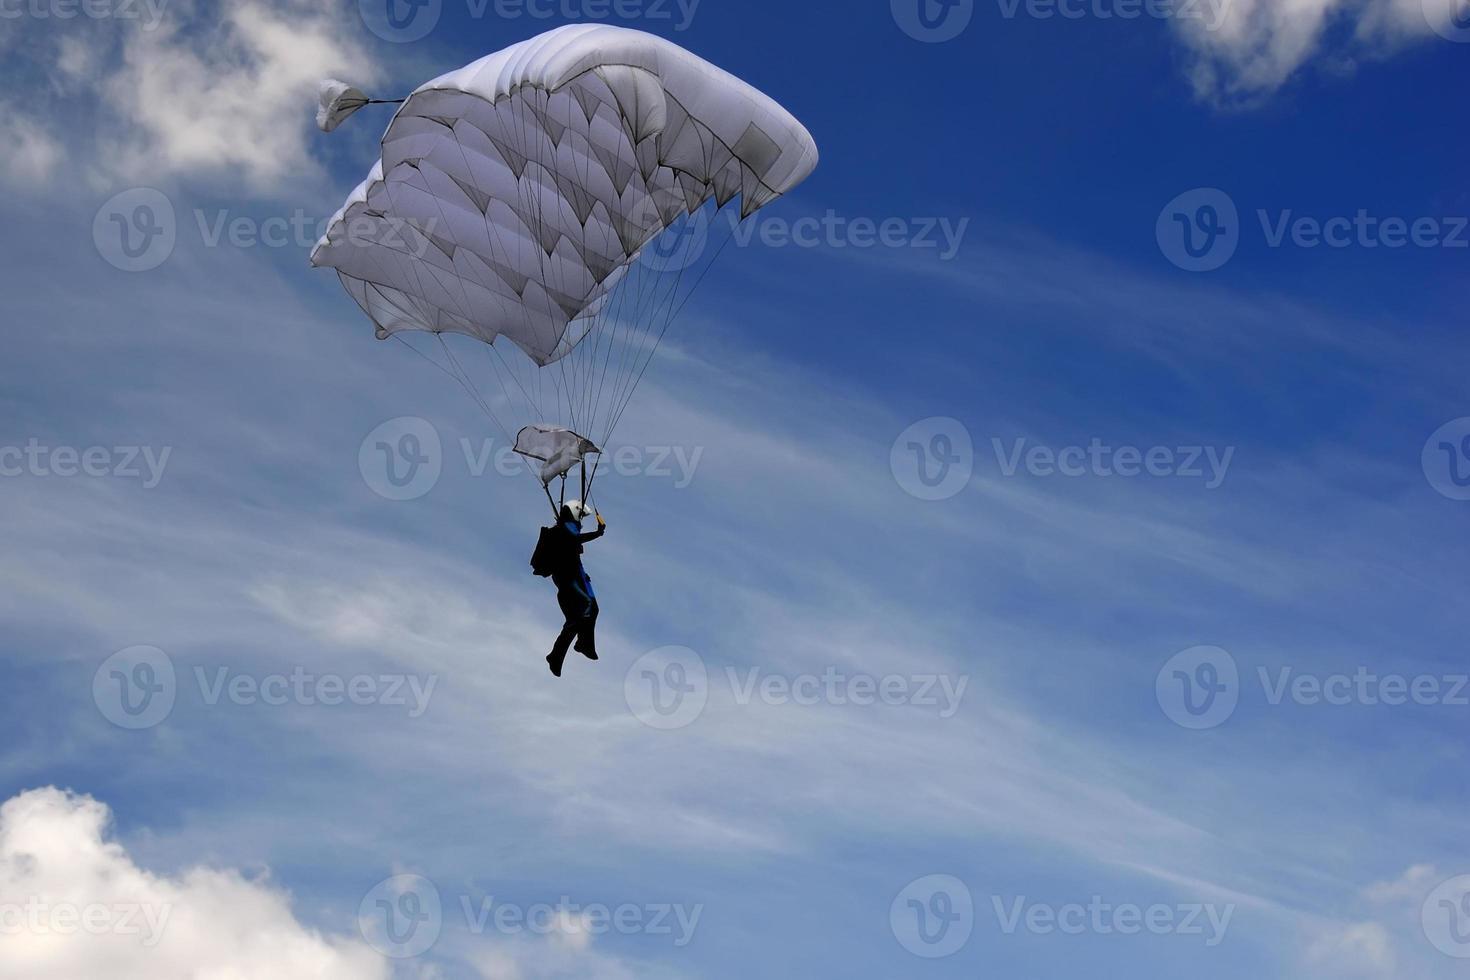 Skydiver in the sky photo